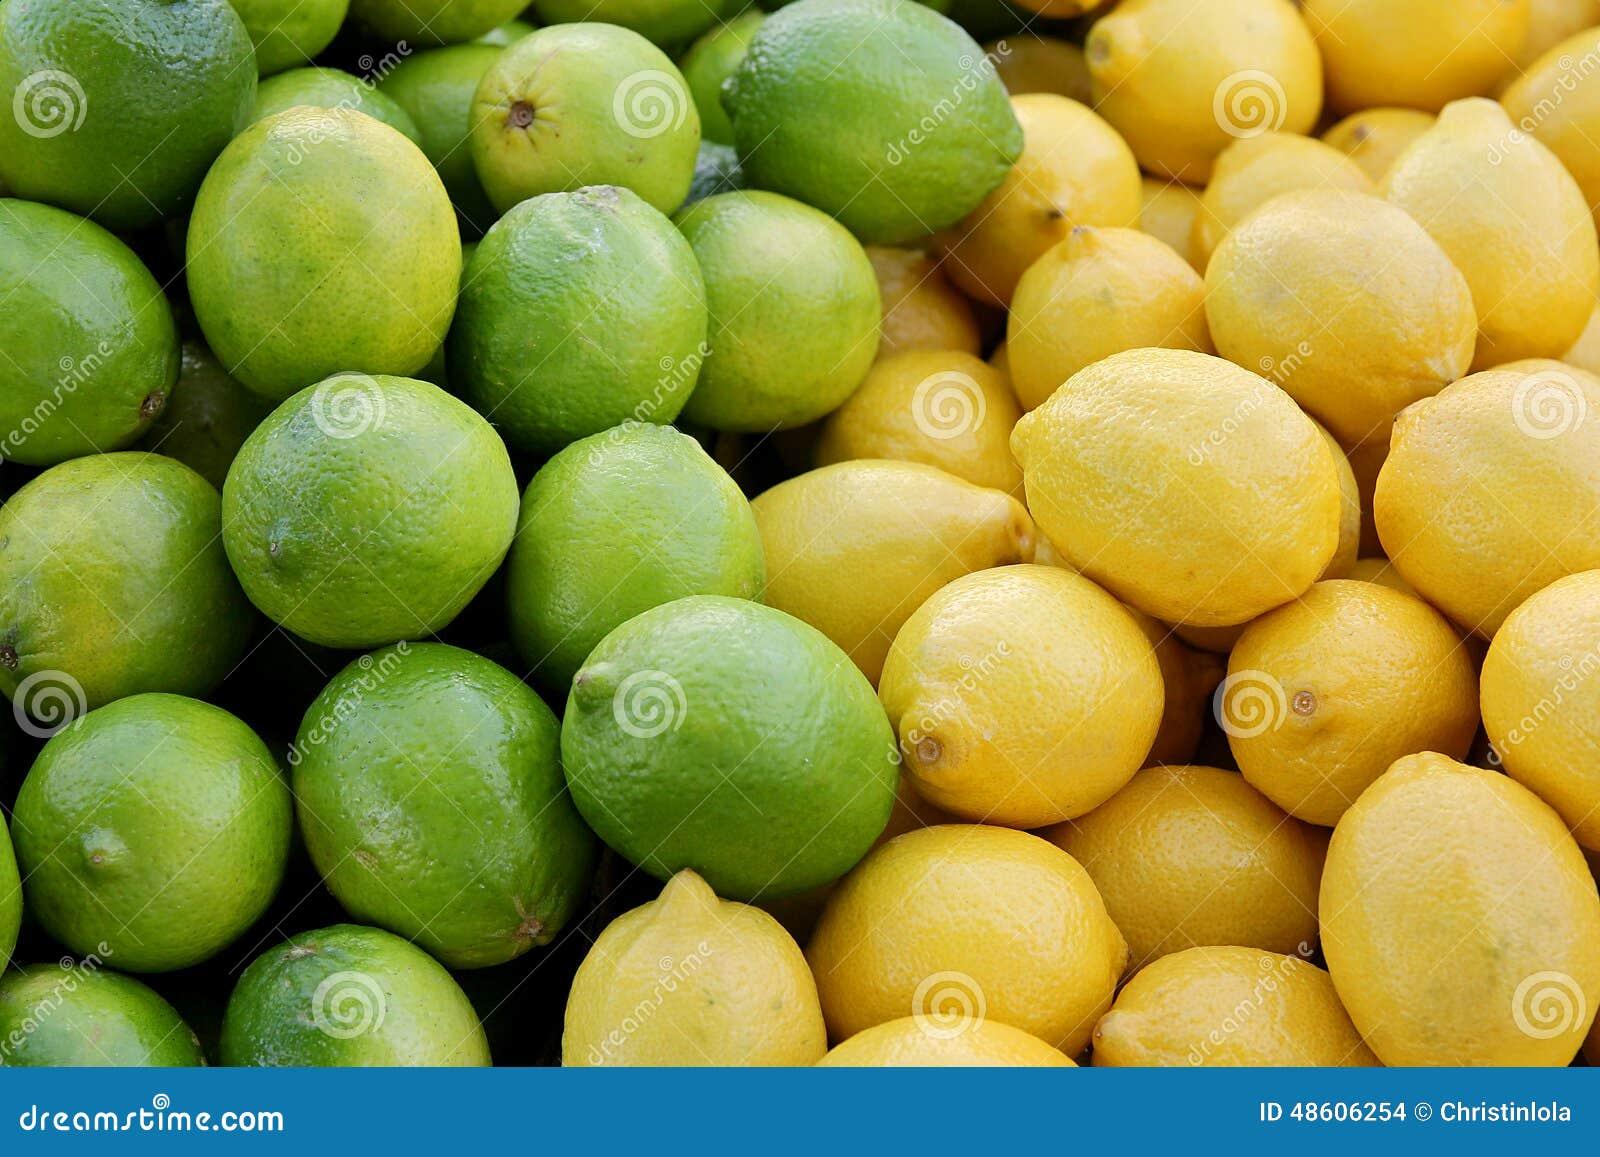 brazil lemons and limes market